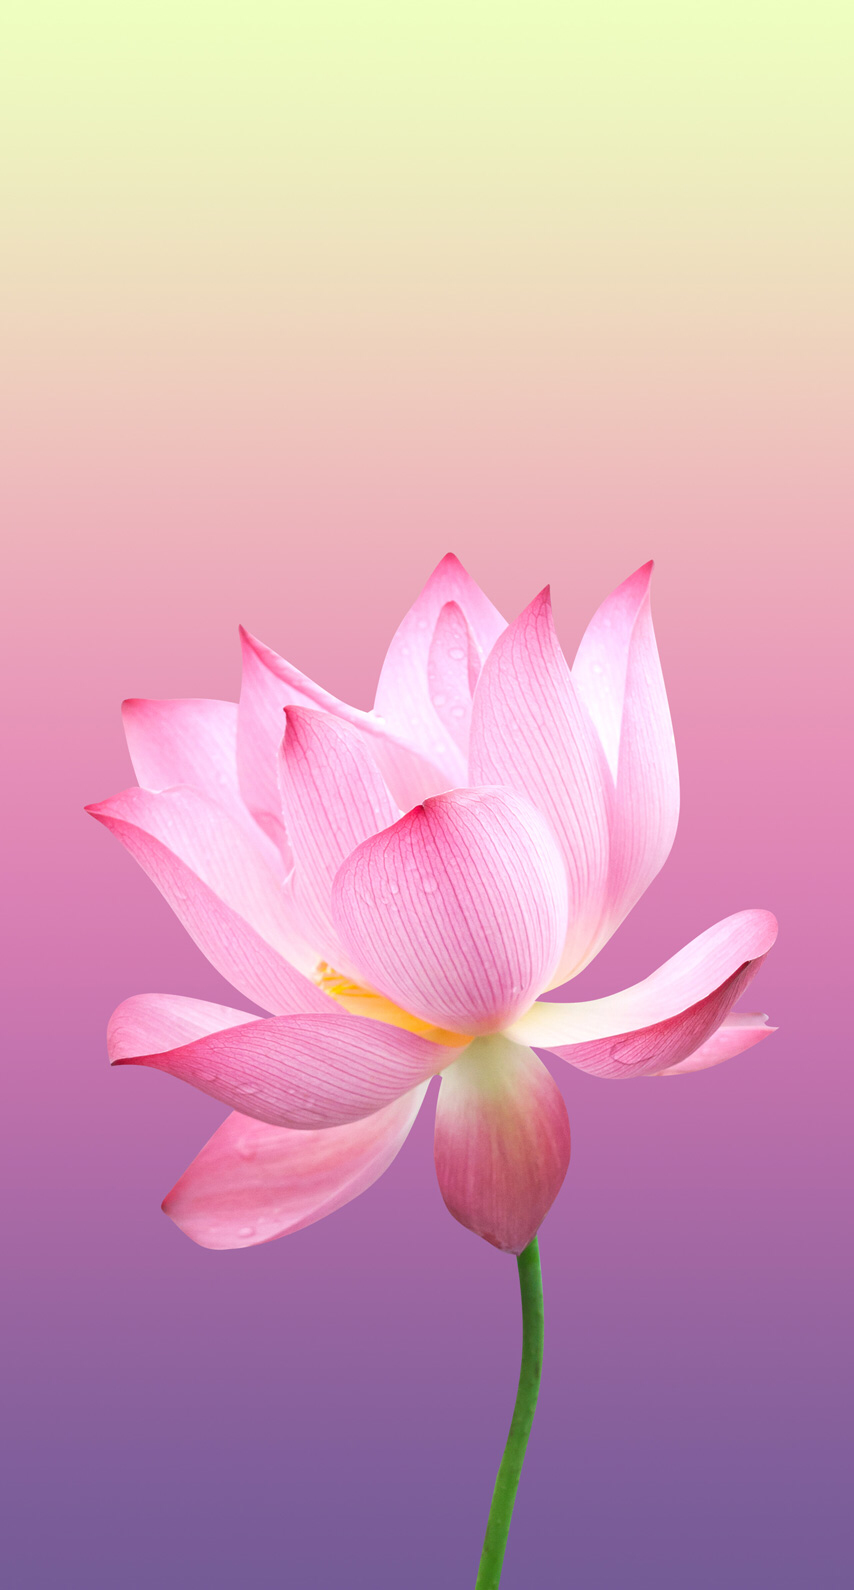 Pin by Asmaa usama on asana Wallpaper nature flowers